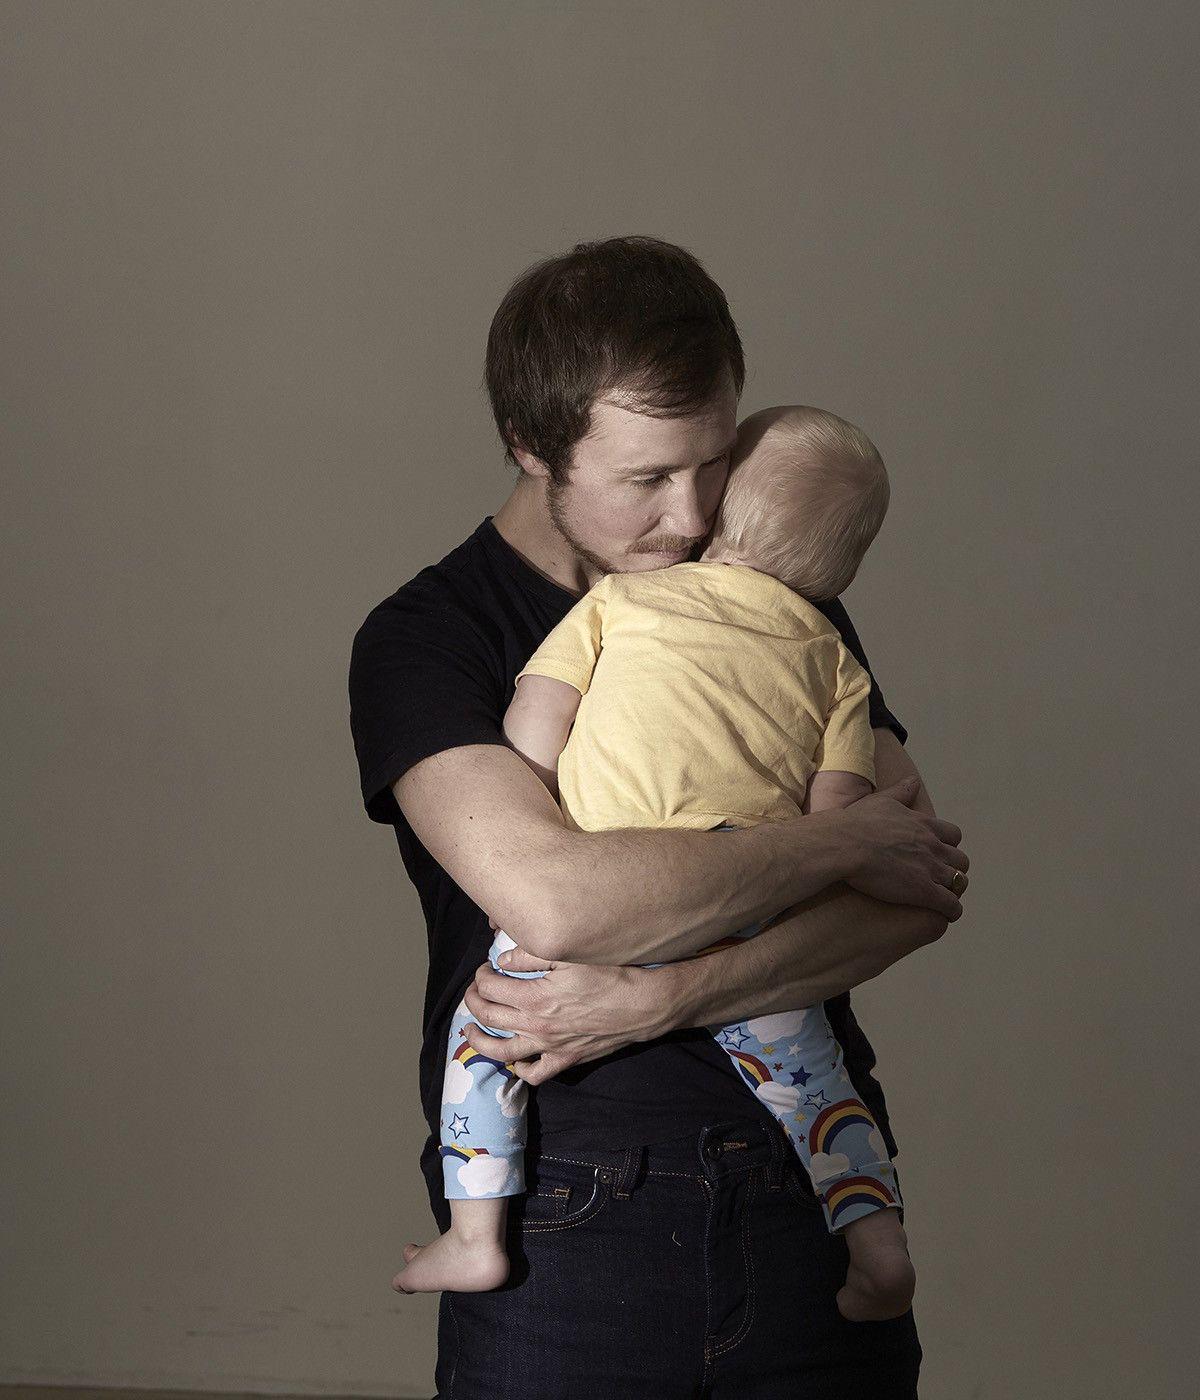 Man holds child